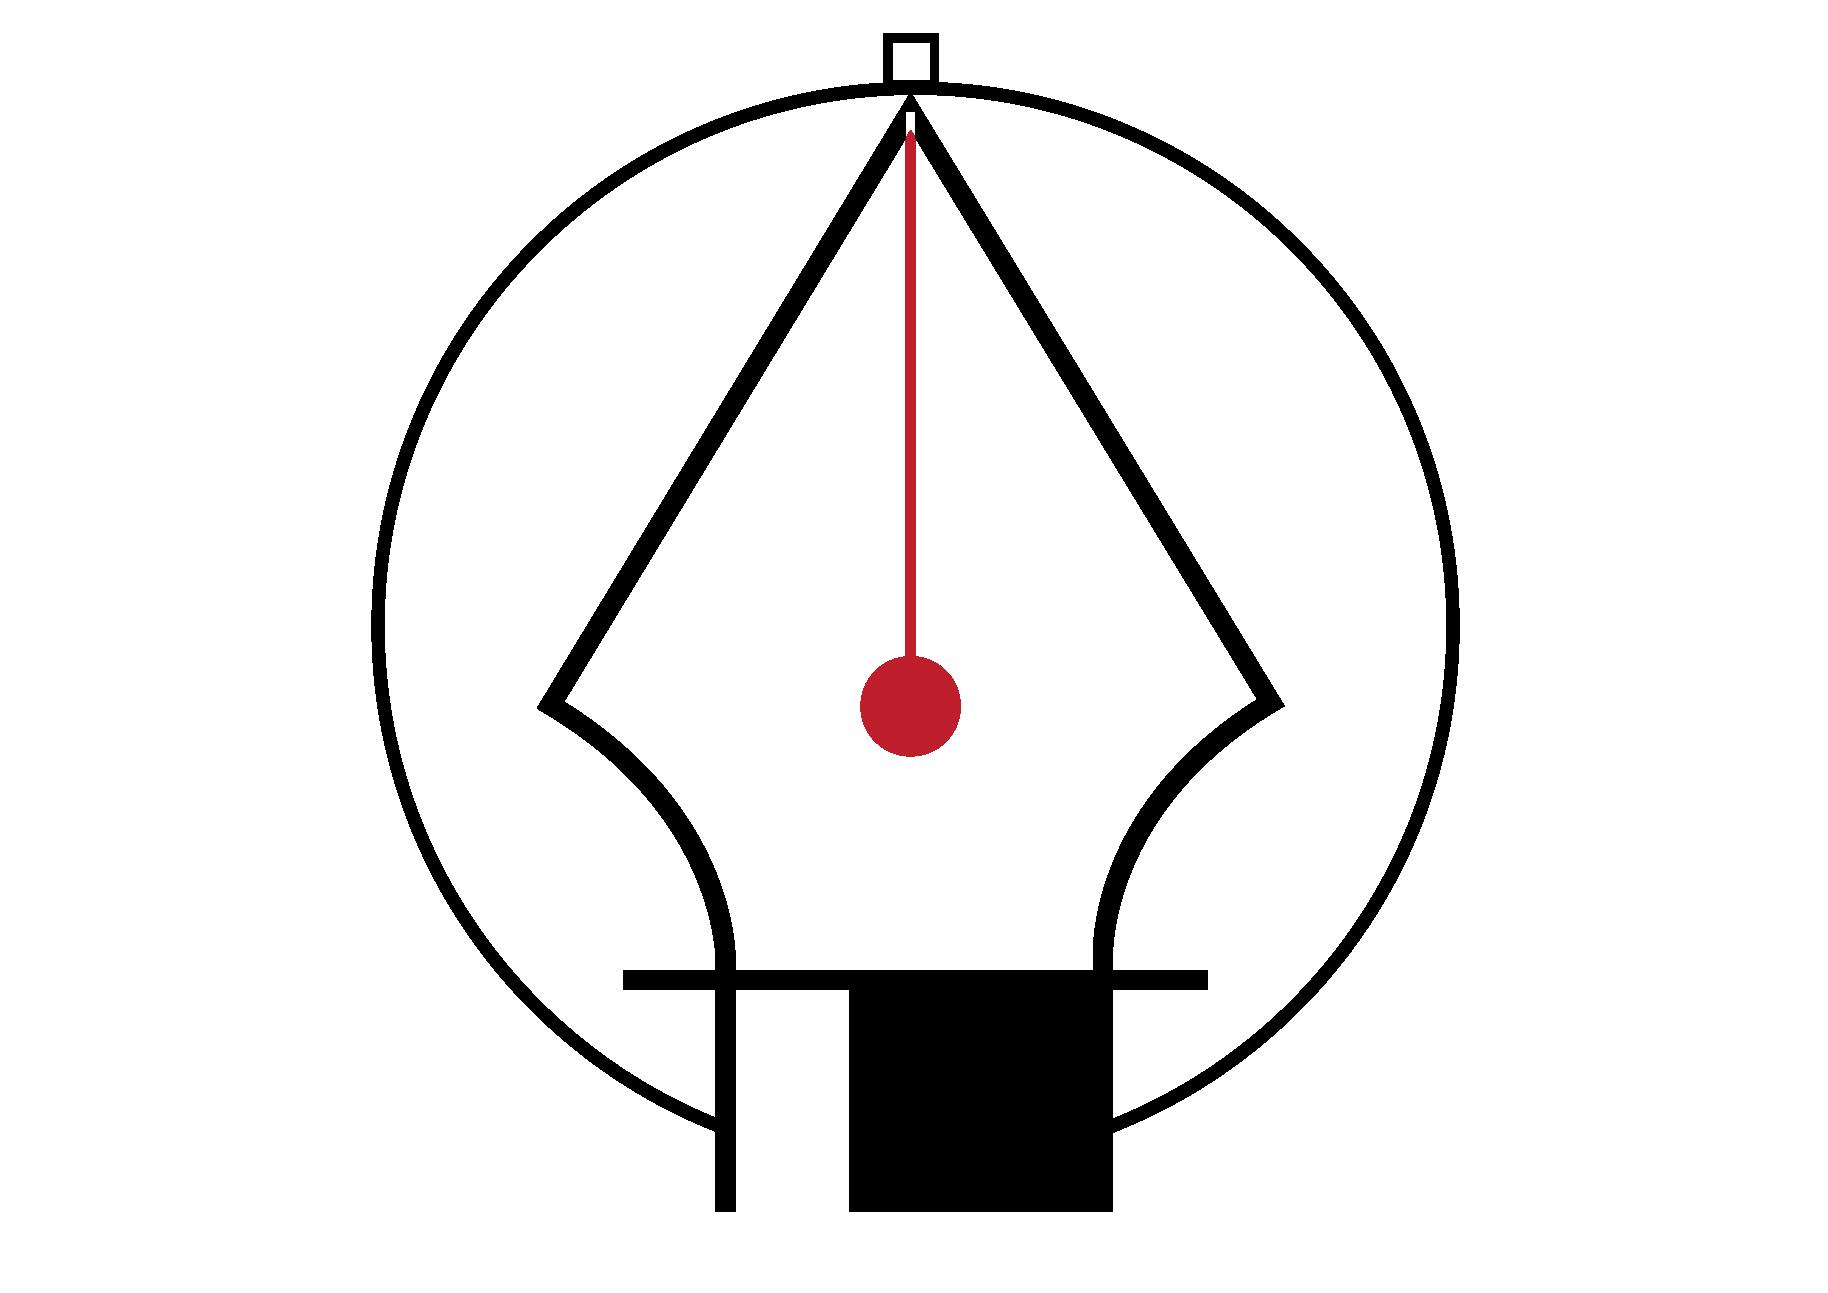 Graphic Design Services in Dehradun